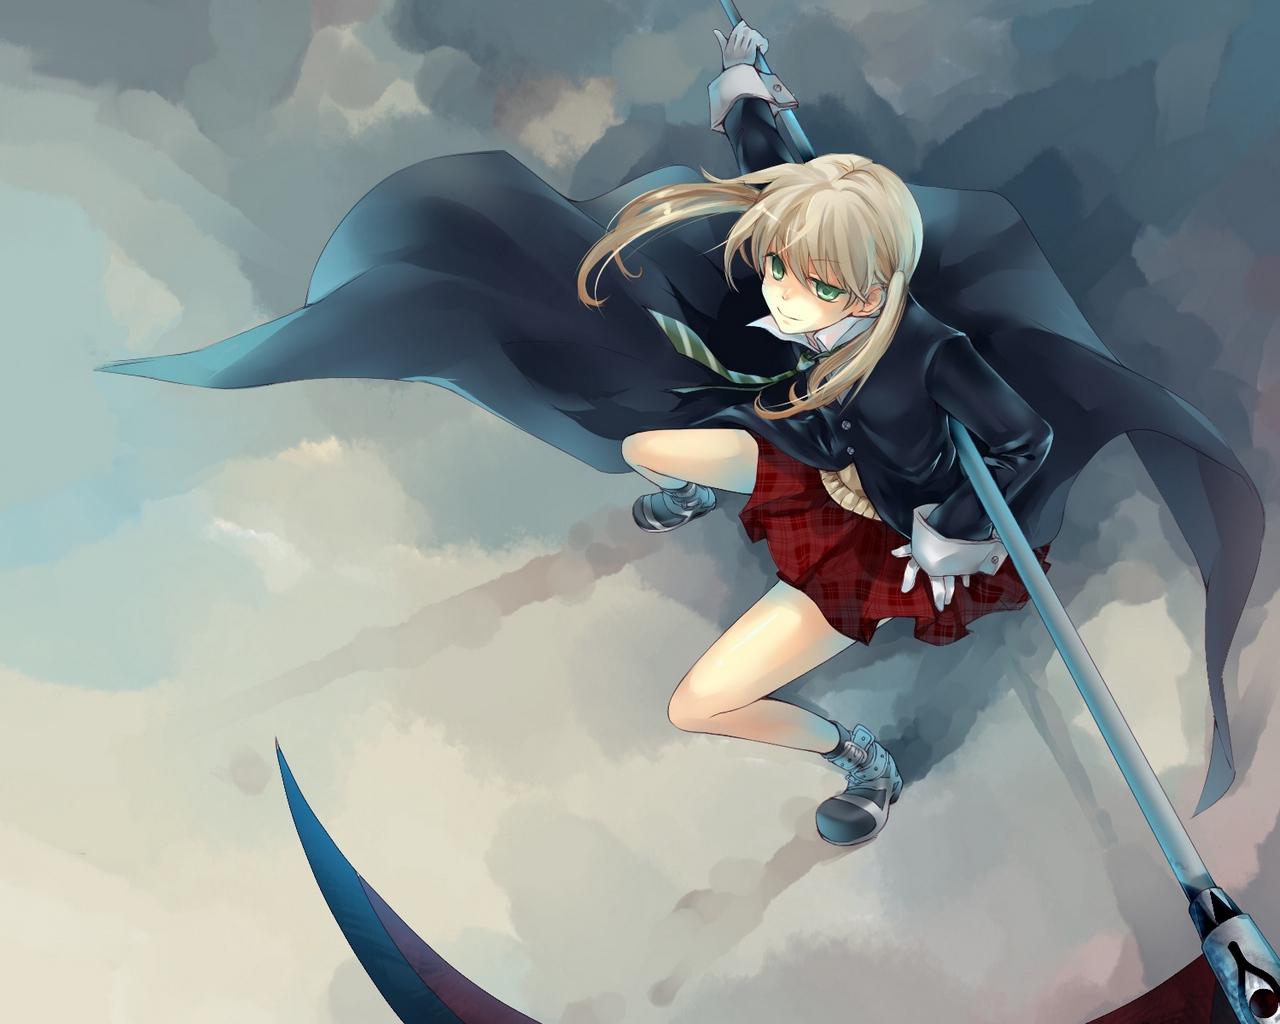 Wallpaper Anime, Girl, Air, Guns, Coat, Commitment - Anime Girl With A Gun - HD Wallpaper